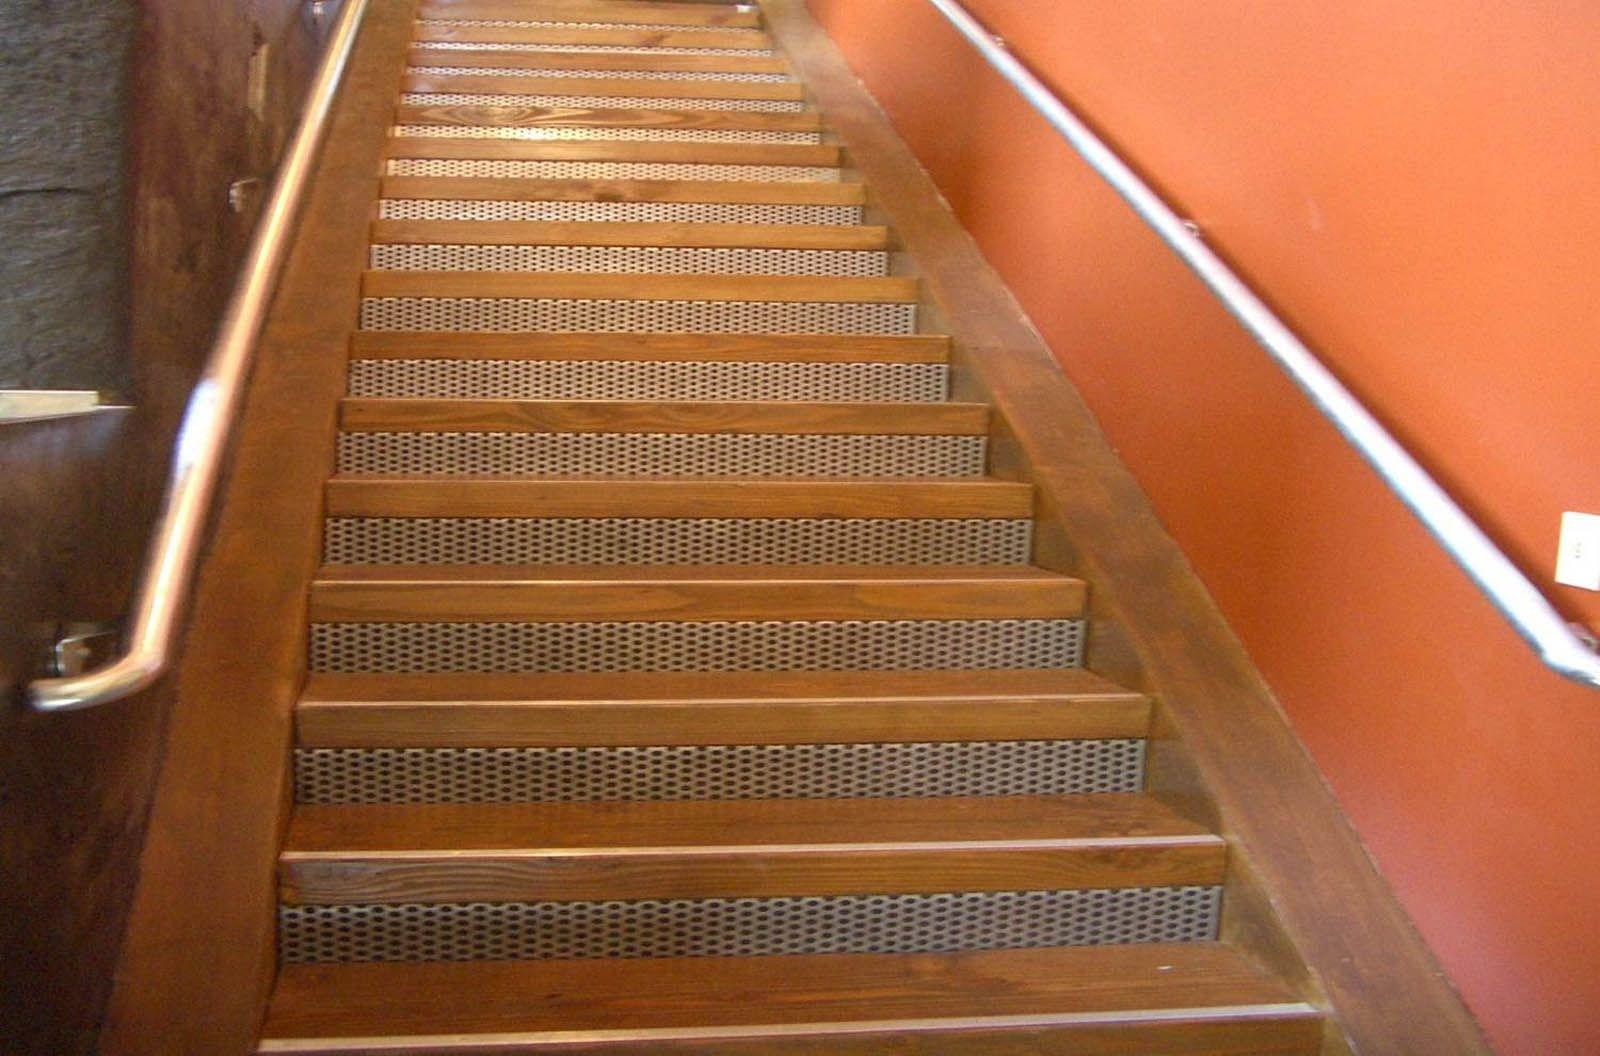 Metal Stair Treads Risers Perforated Metal Stair Panels | Modern Stair Treads And Risers | Hardwood | Non Slip | Riser Short Stringer | Cap | Luxury Vinyl Stair